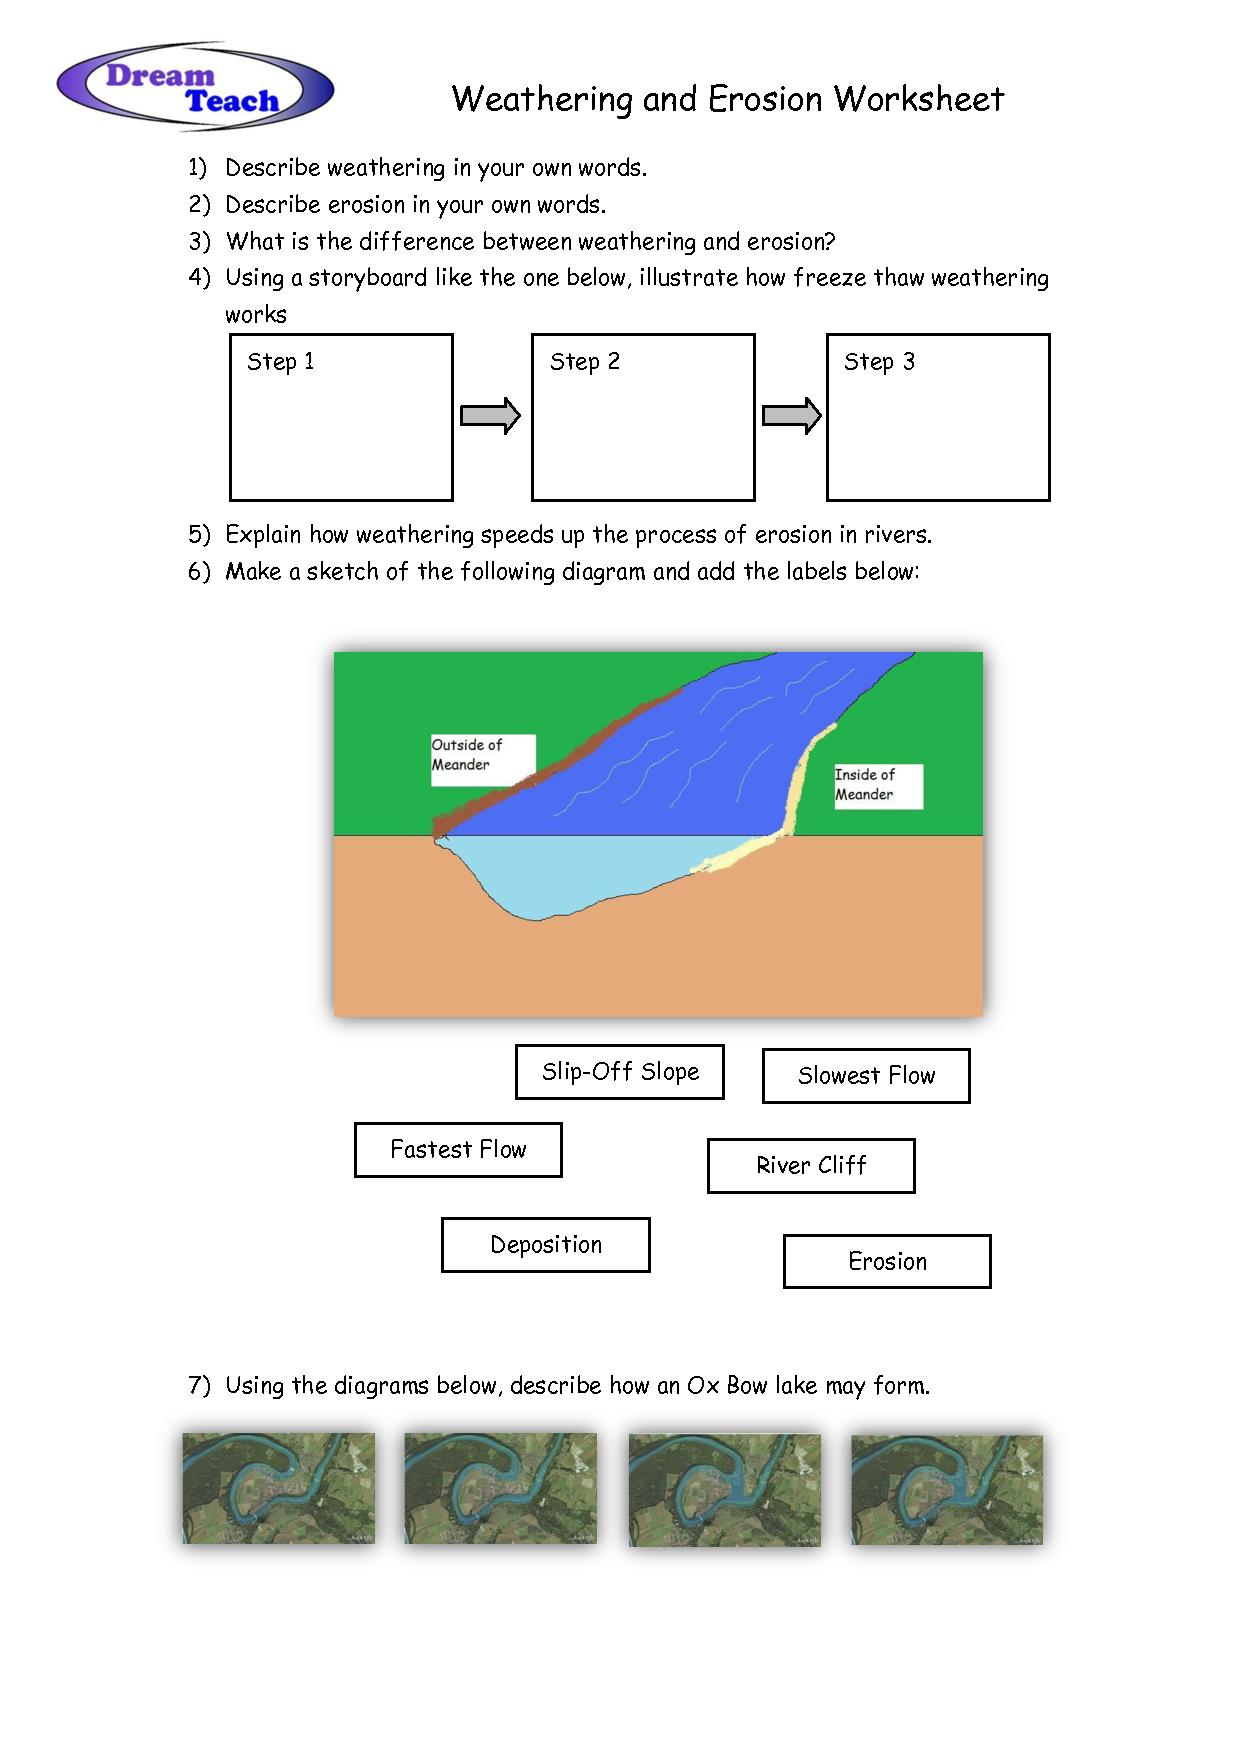 medium resolution of Weathering And Erosion Worksheet   Weathering and erosion